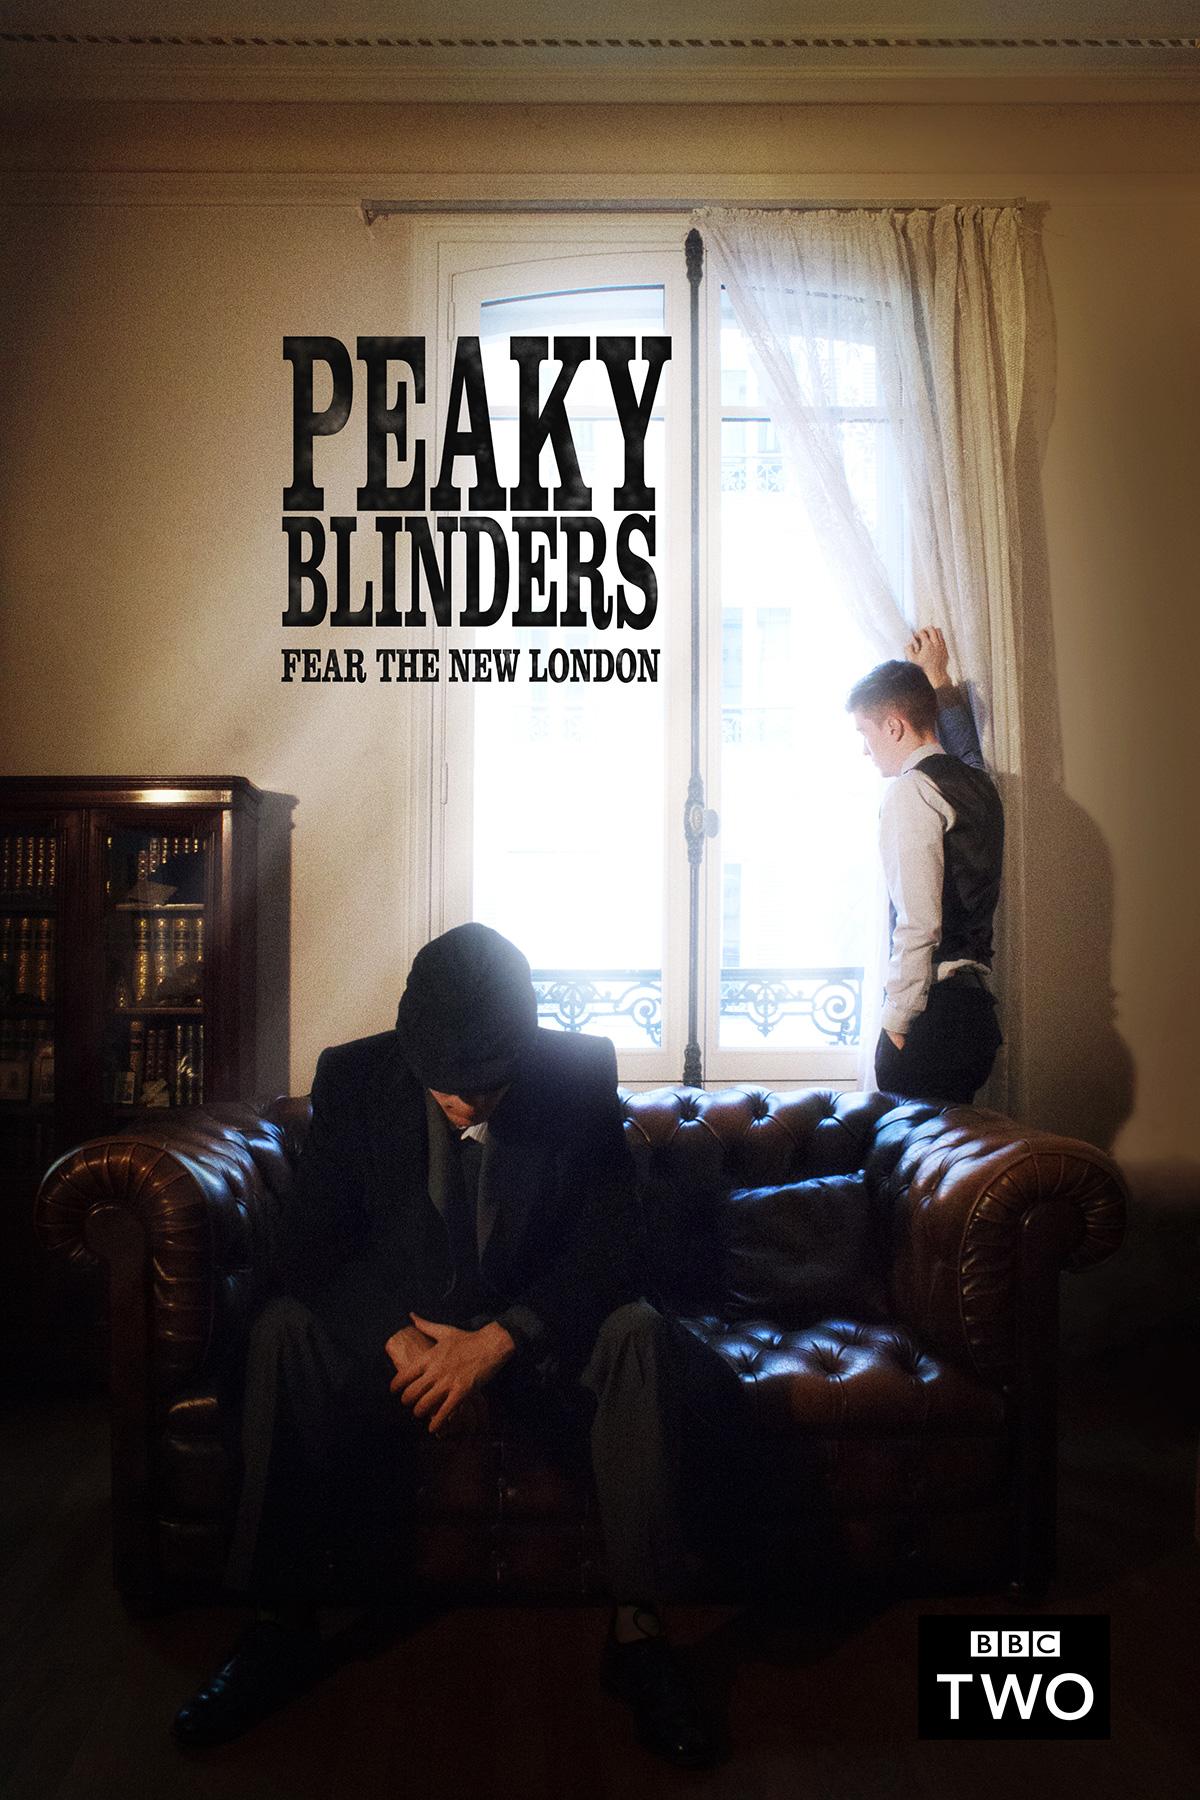 peaky blinders pastiche